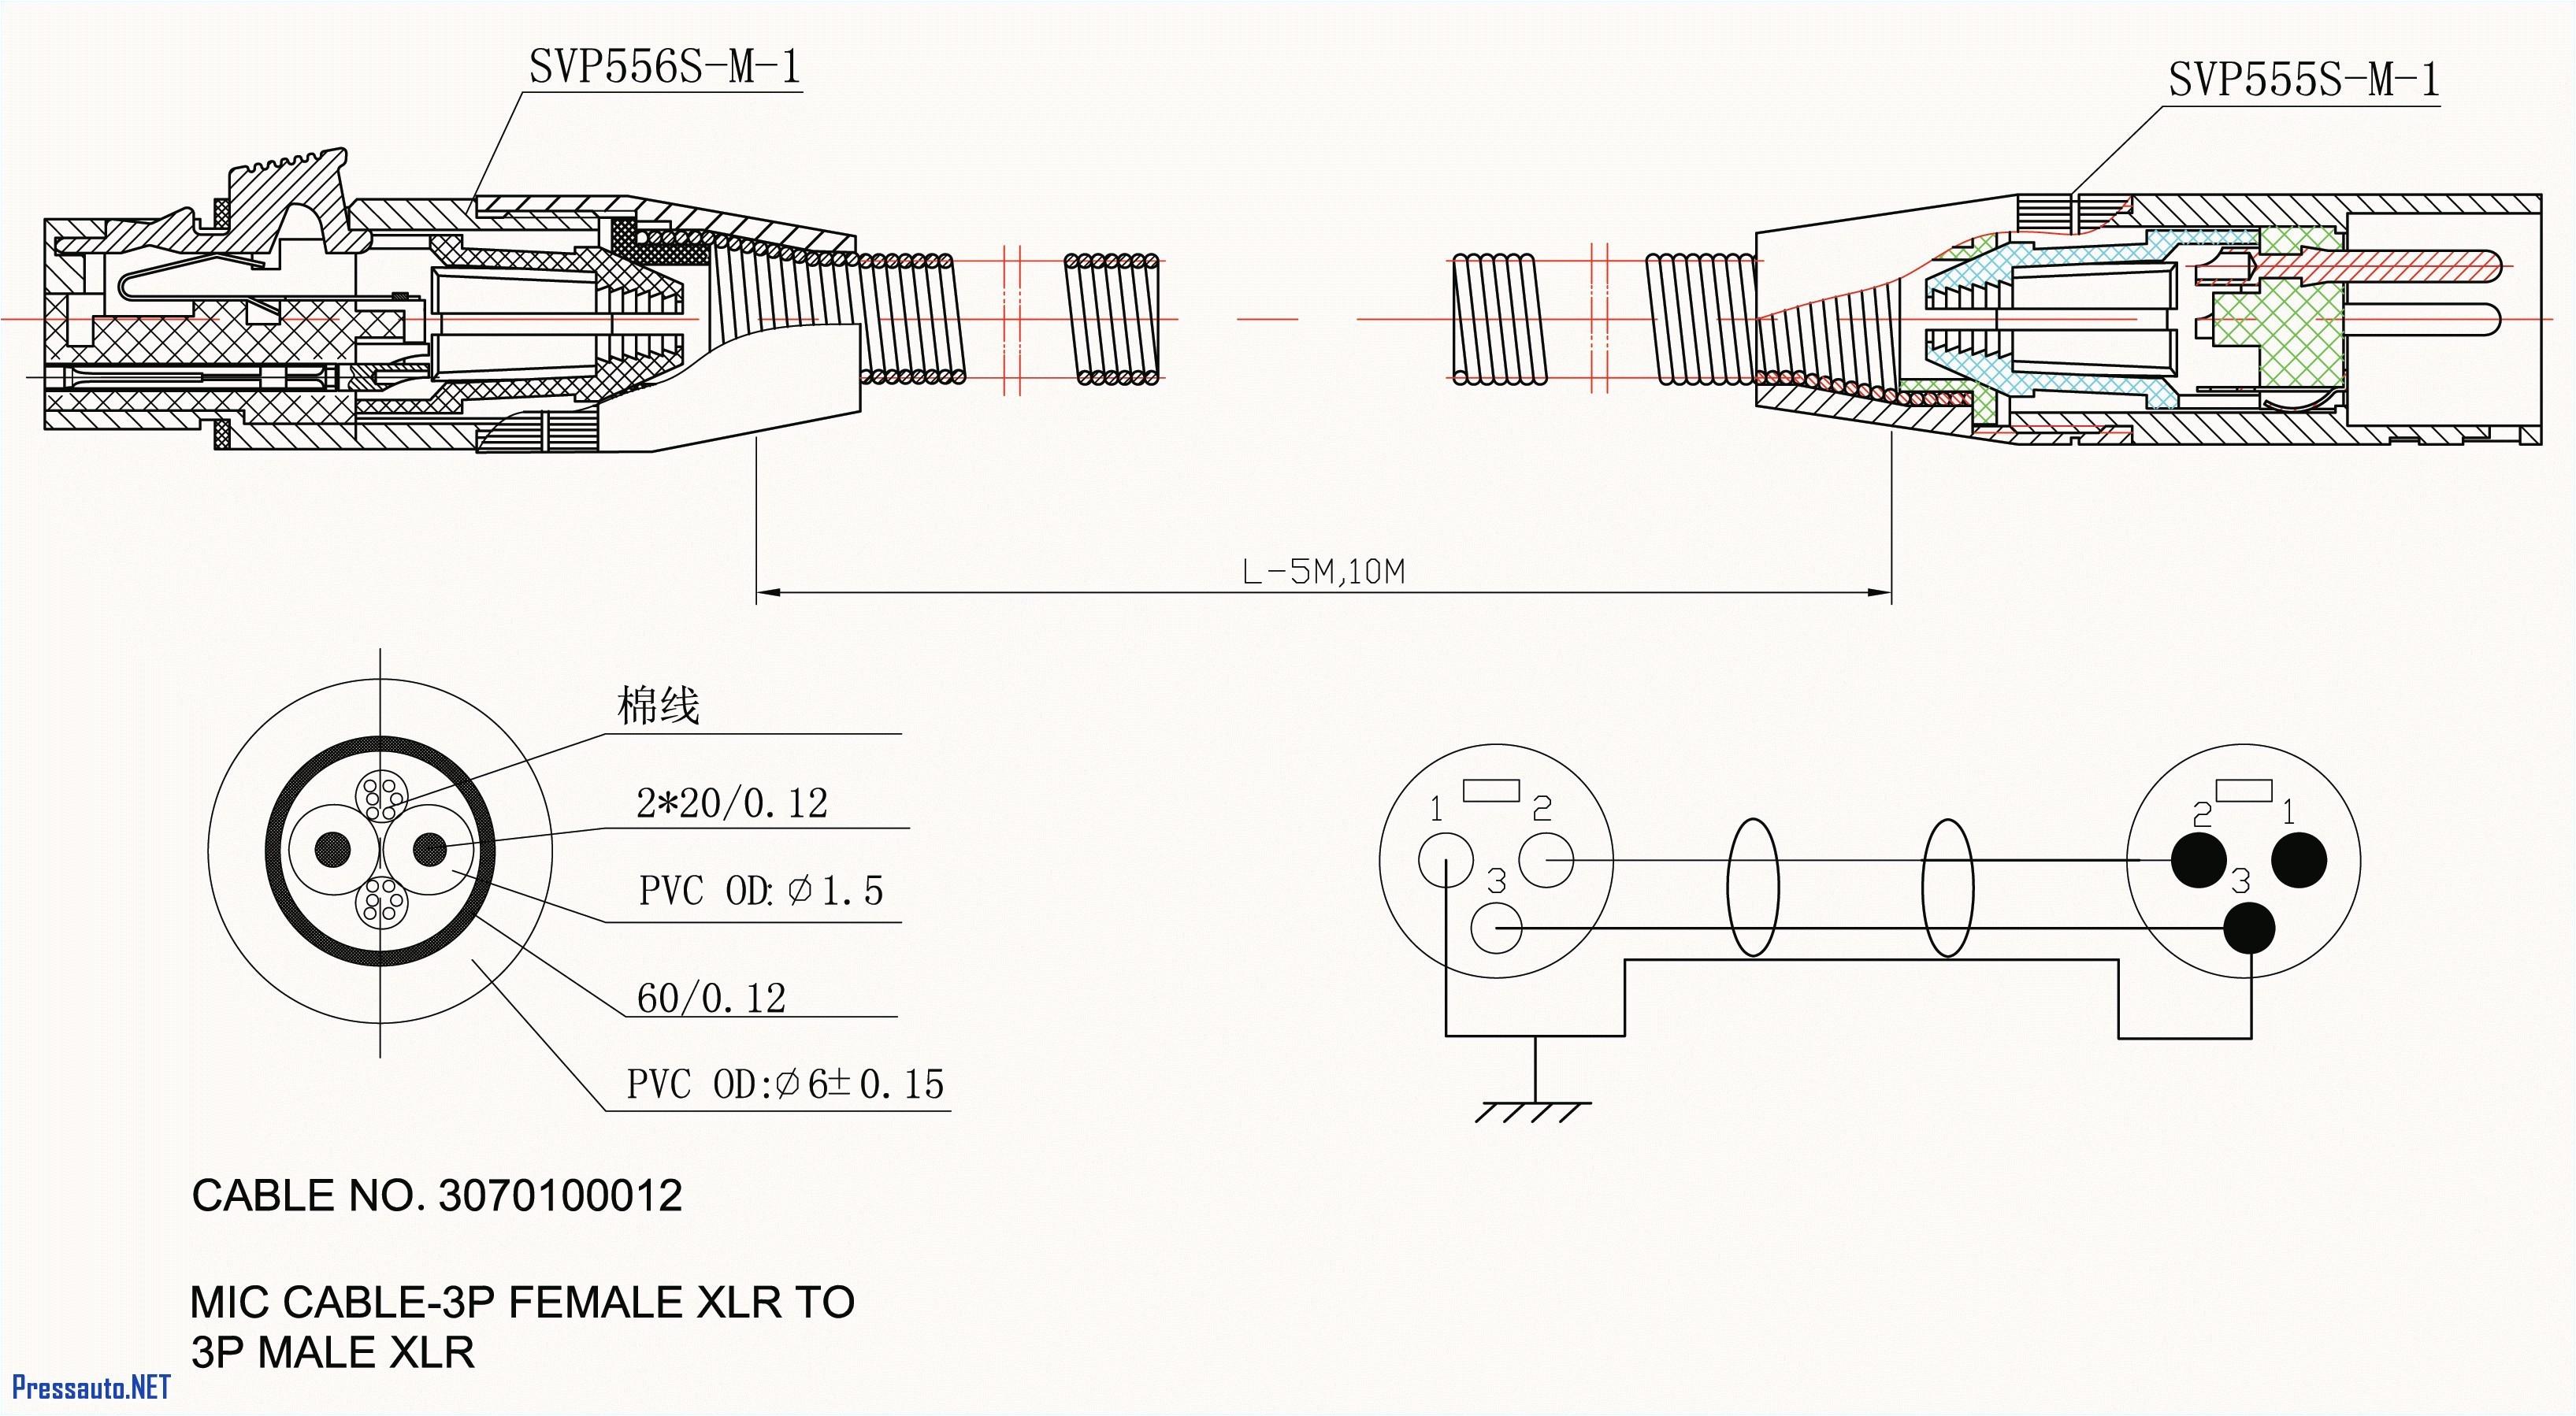 makita 2703 wiring diagram new wiring switch diagram dormanmakita 2703 wiring diagram elegant wiring switch diagram